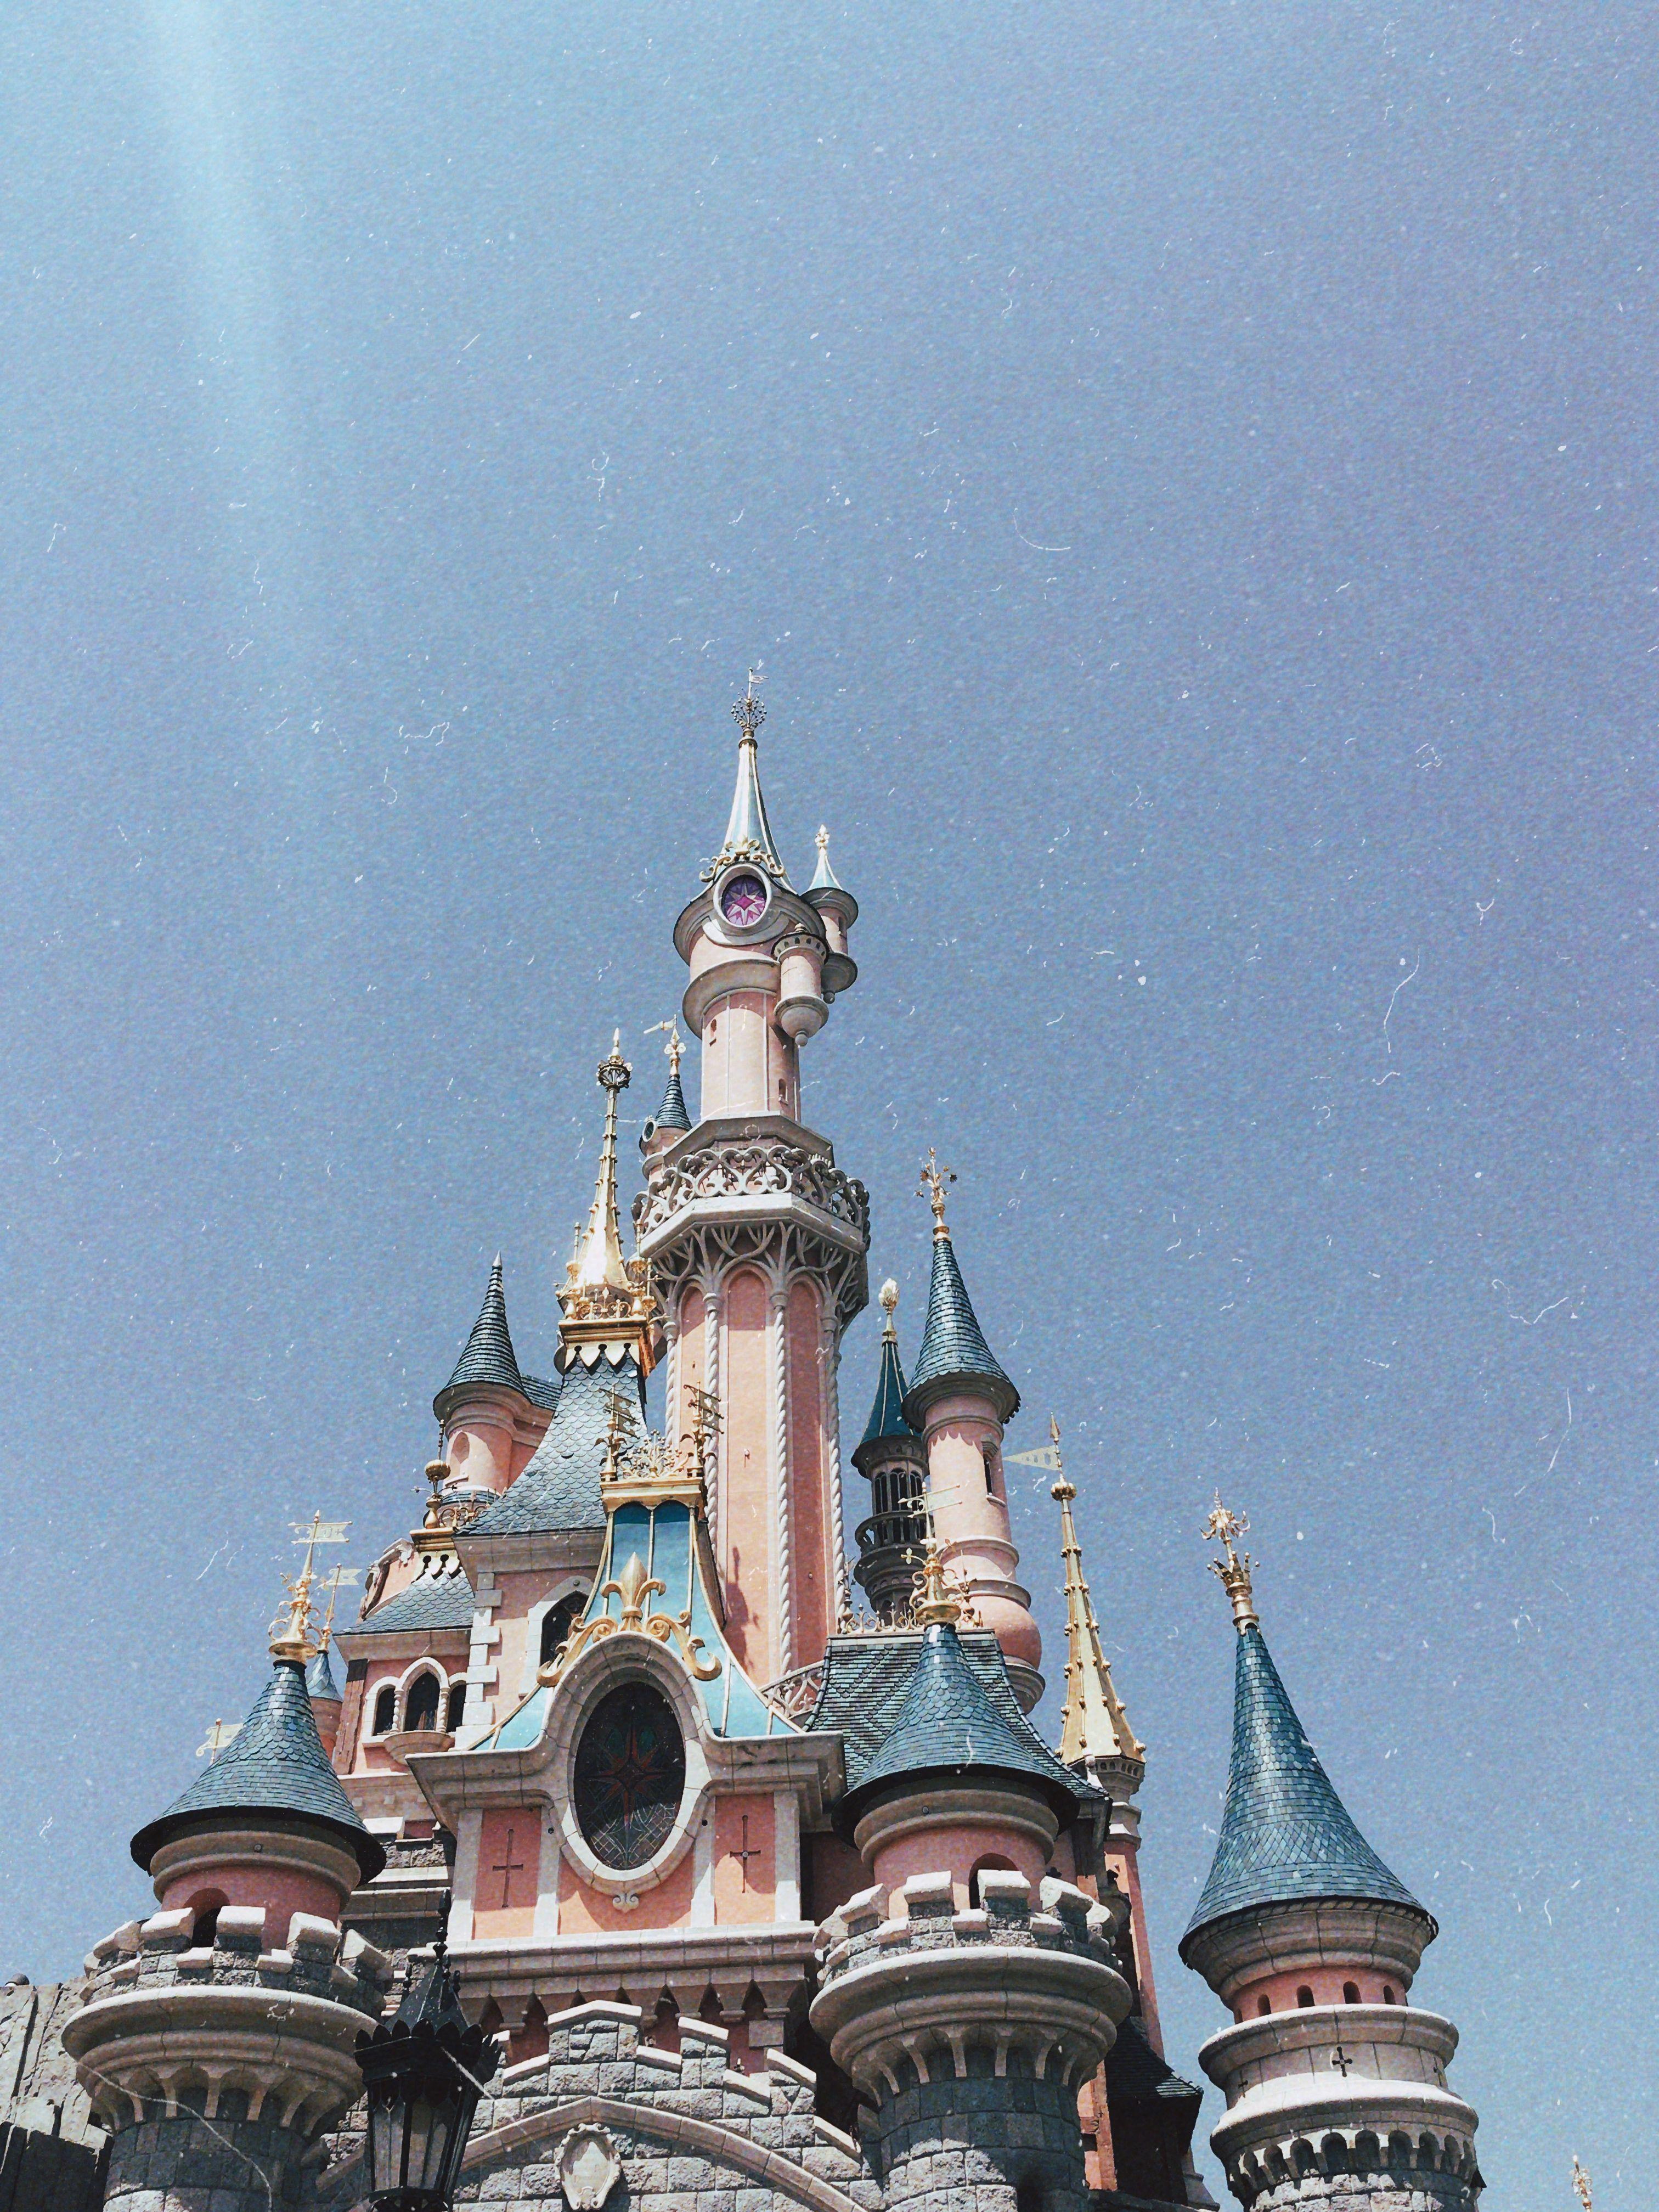 Disneyland disney disneylandparis disneylandpictures